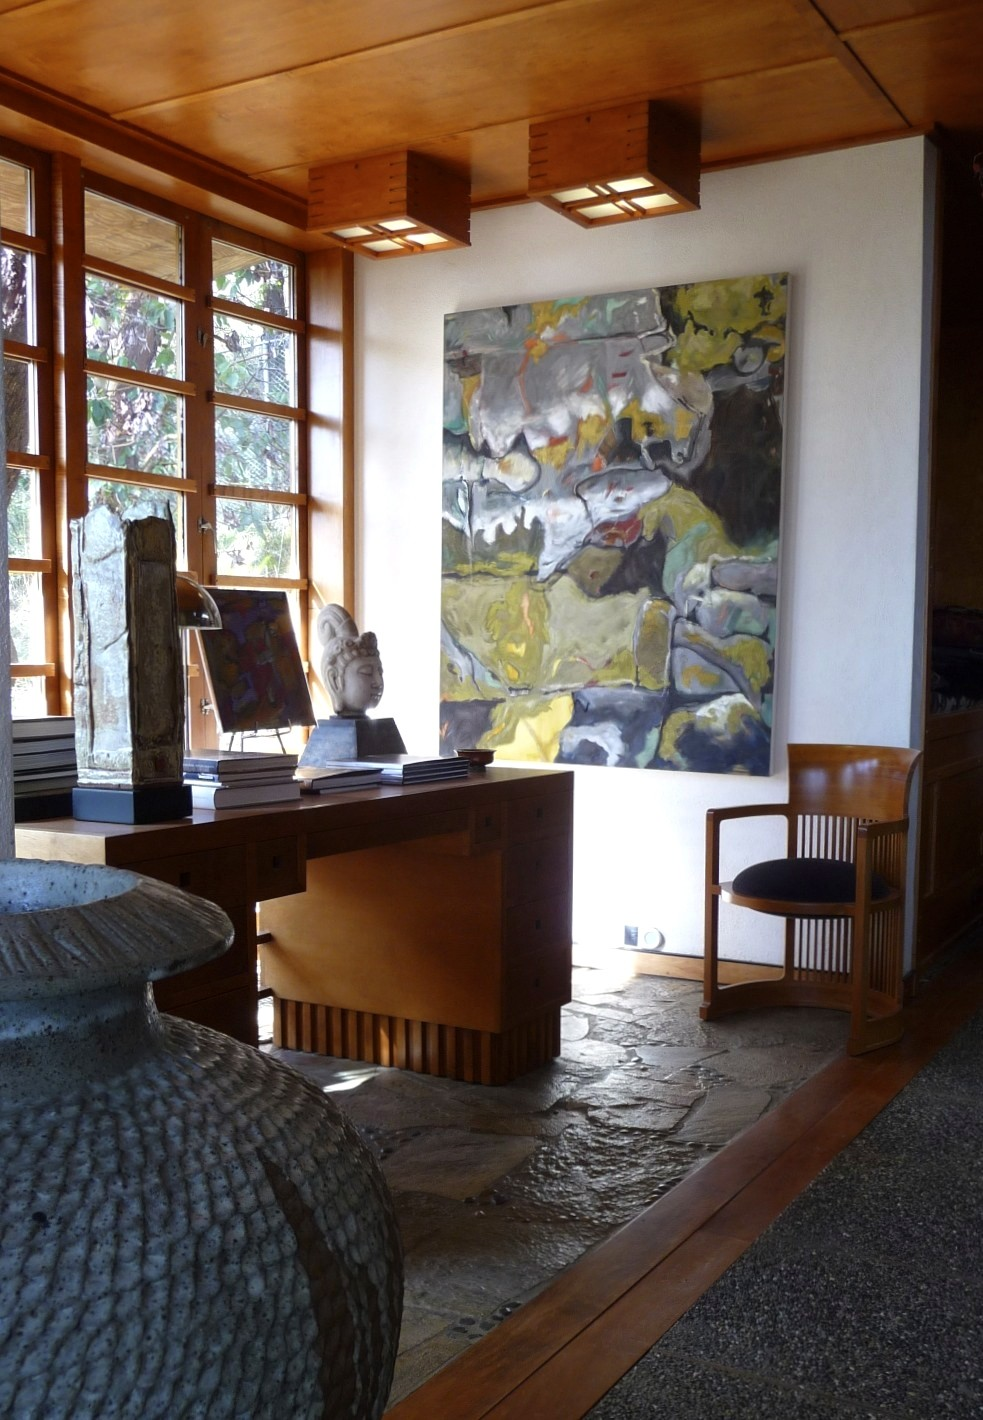 barbra edwards contemporary artist on Pender Island oil painting